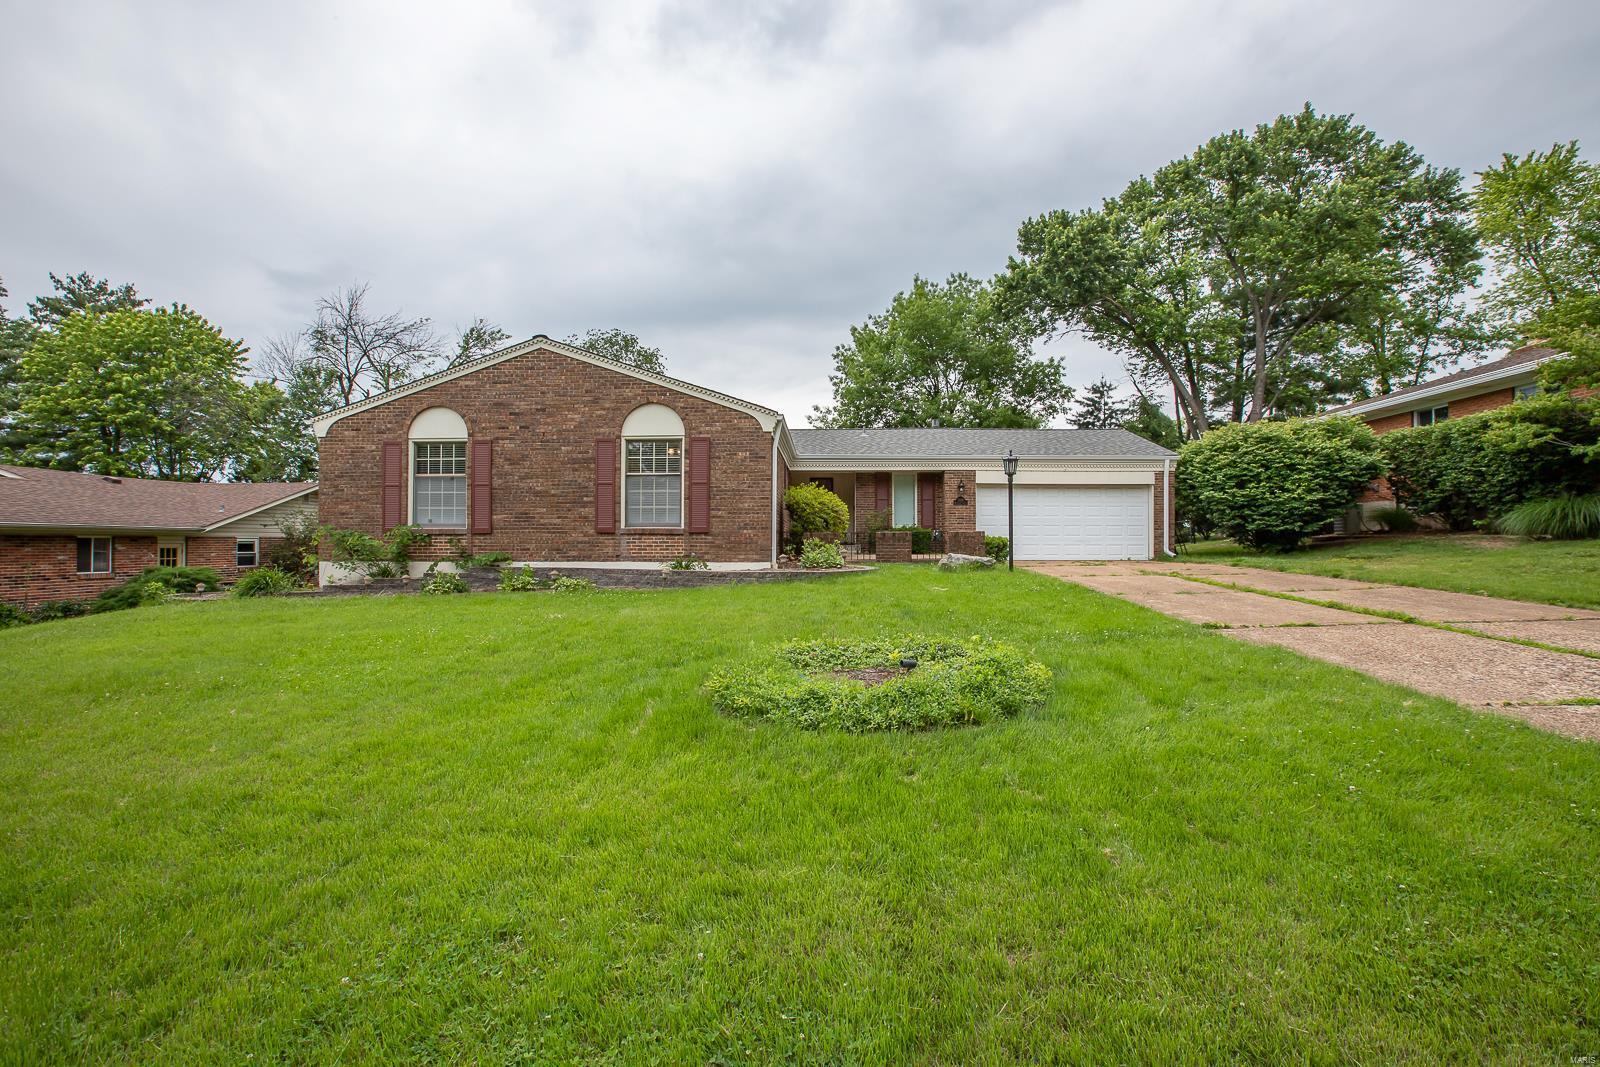 1009 Bridgeport Drive Property Photo - Ellisville, MO real estate listing